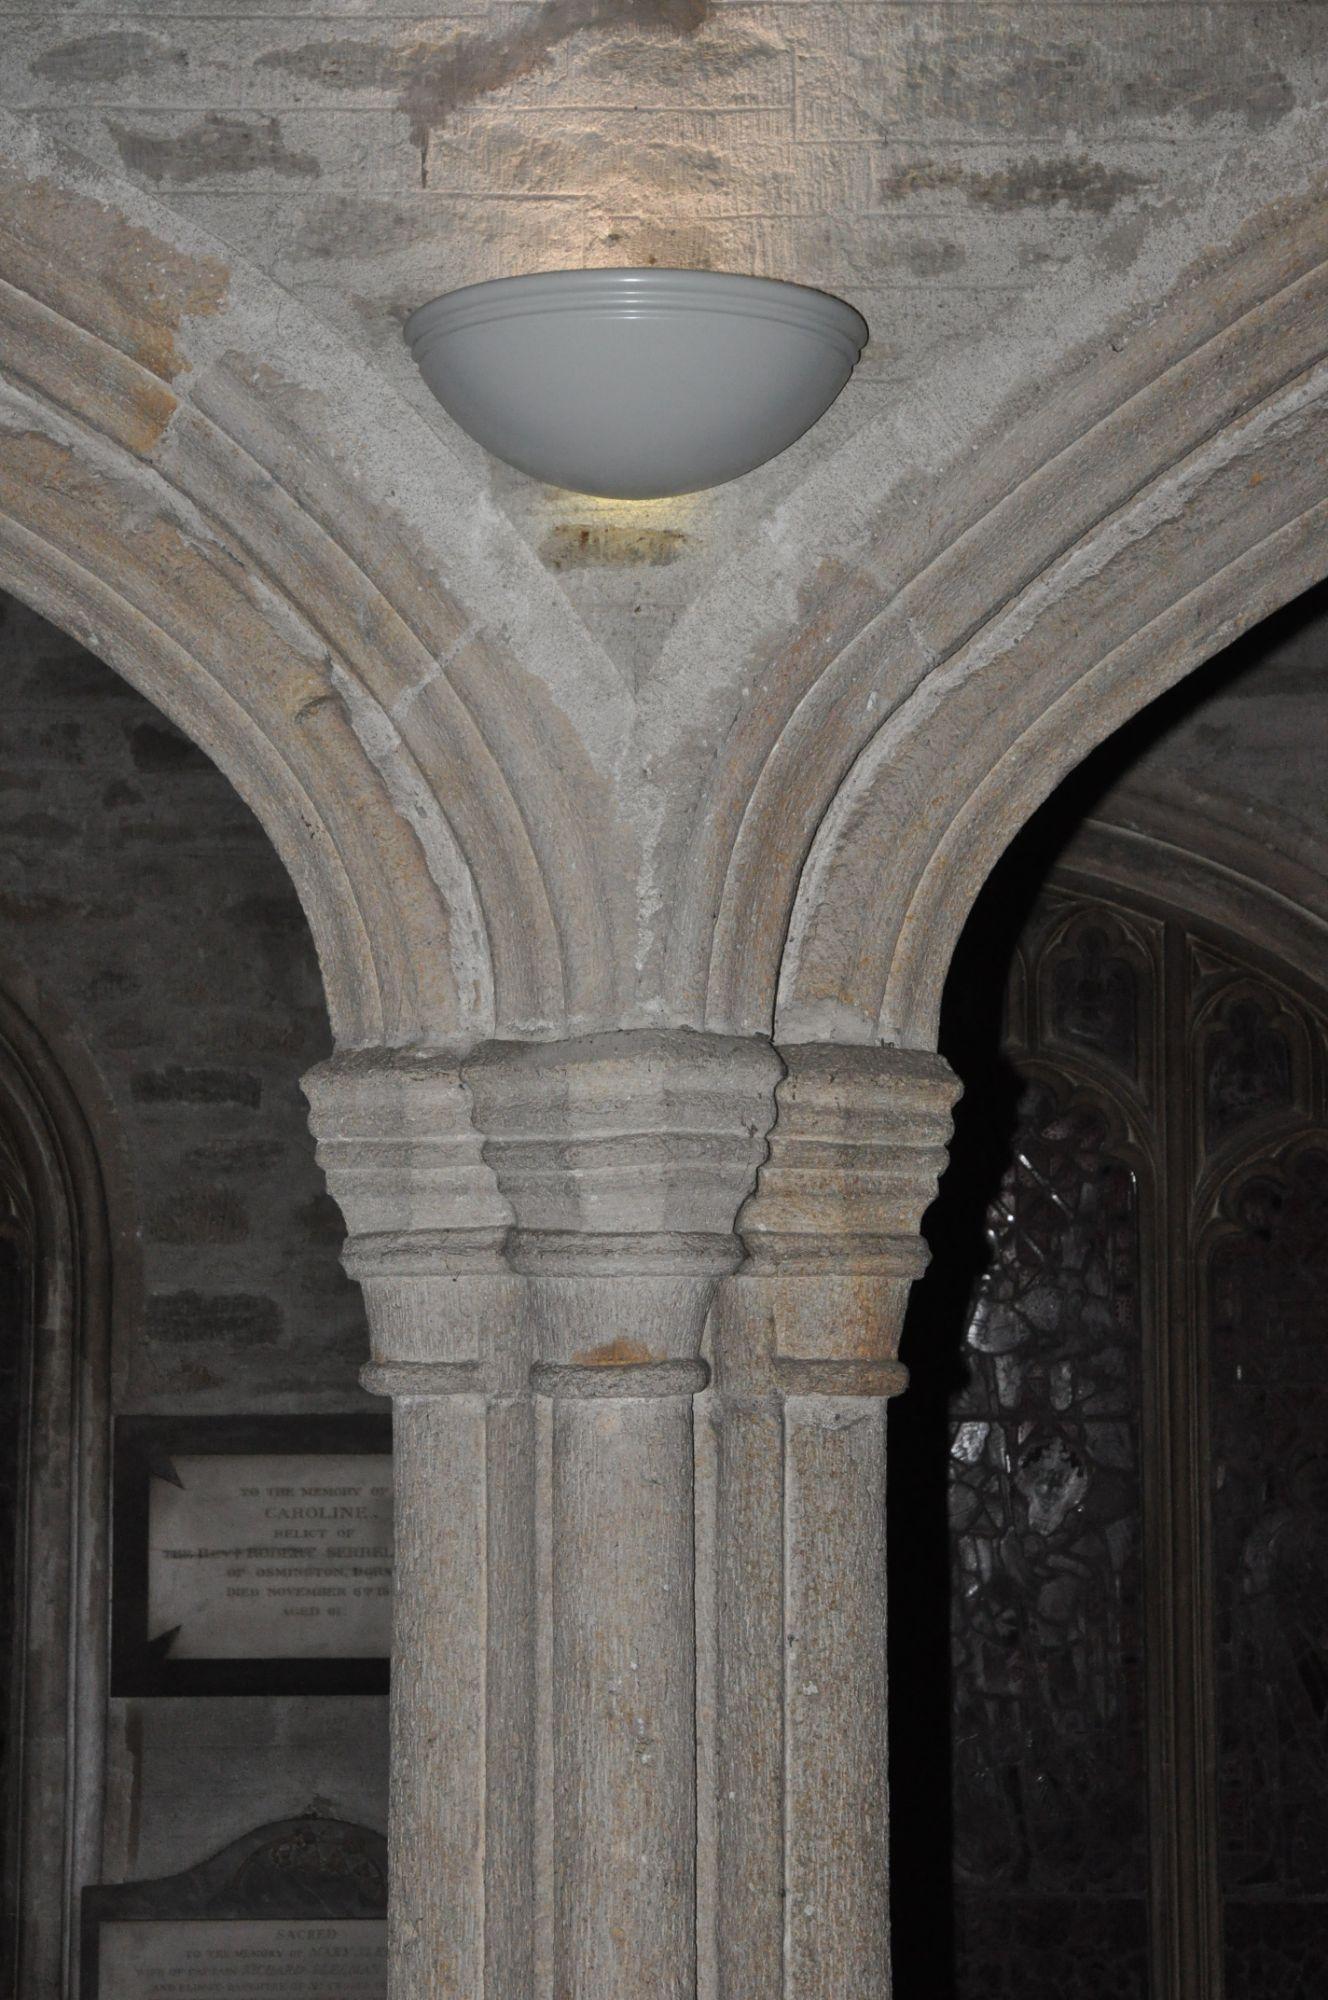 Eclesiastical Architecture, Devon